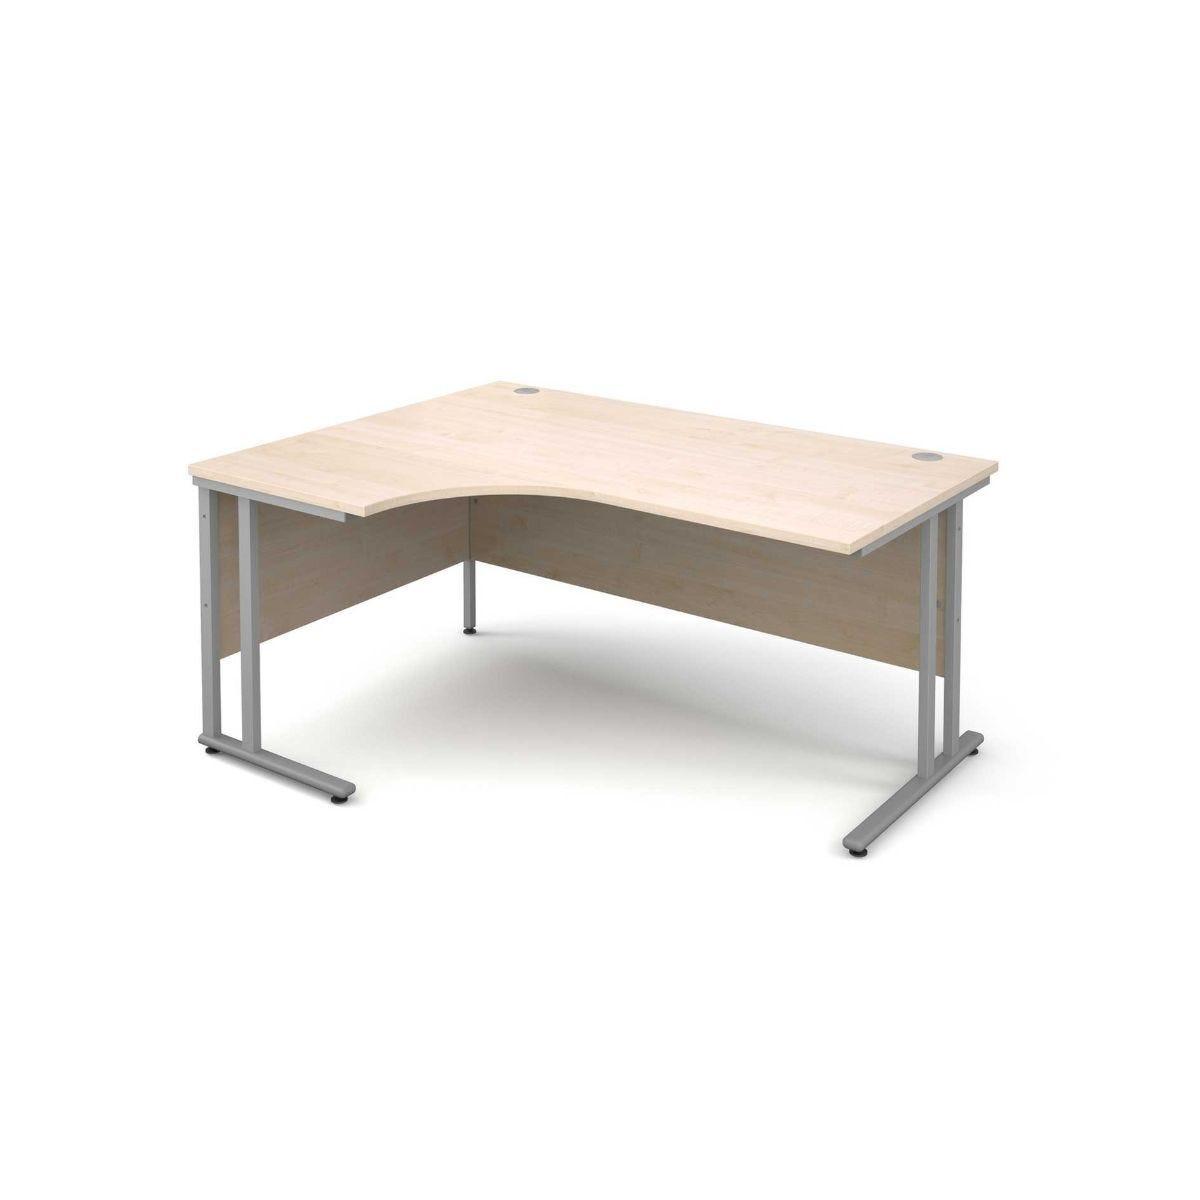 Maestro 25 Left Hand Ergonomic 1600 Desk with Silver Legs